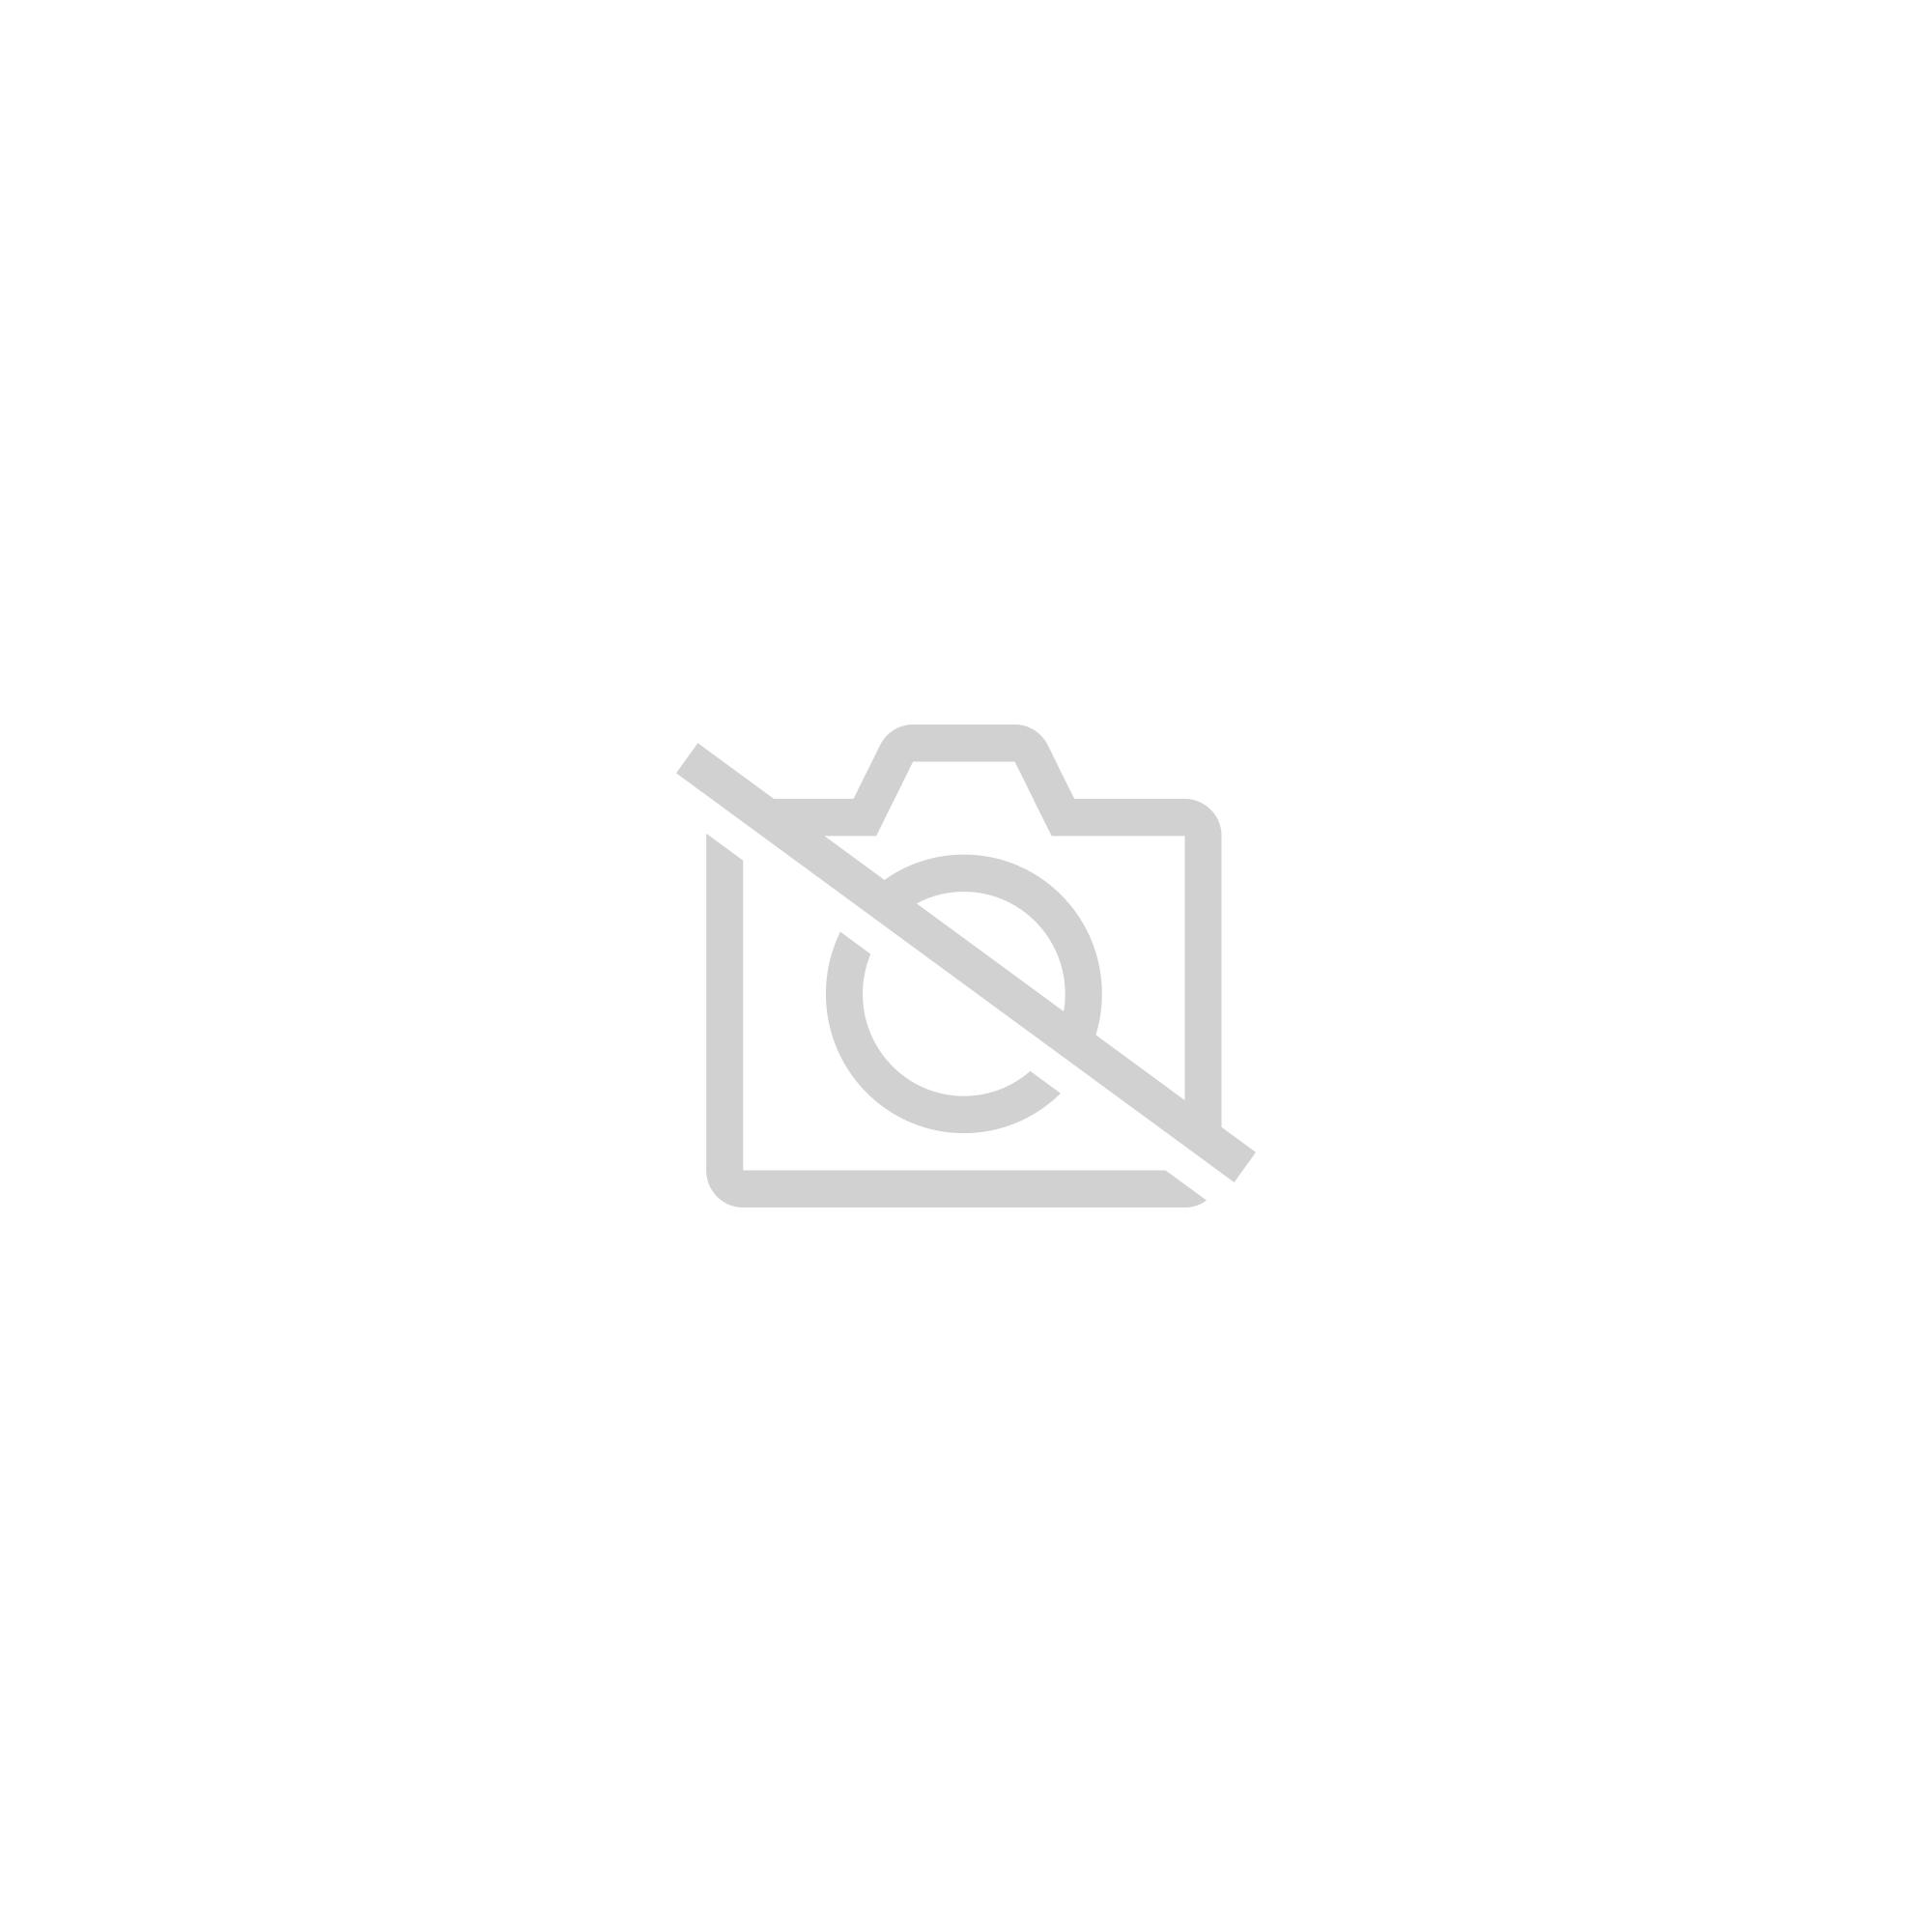 Konad Nouvelle Plaque Rectangulaire Stamping Nail Art Nail Art - 01